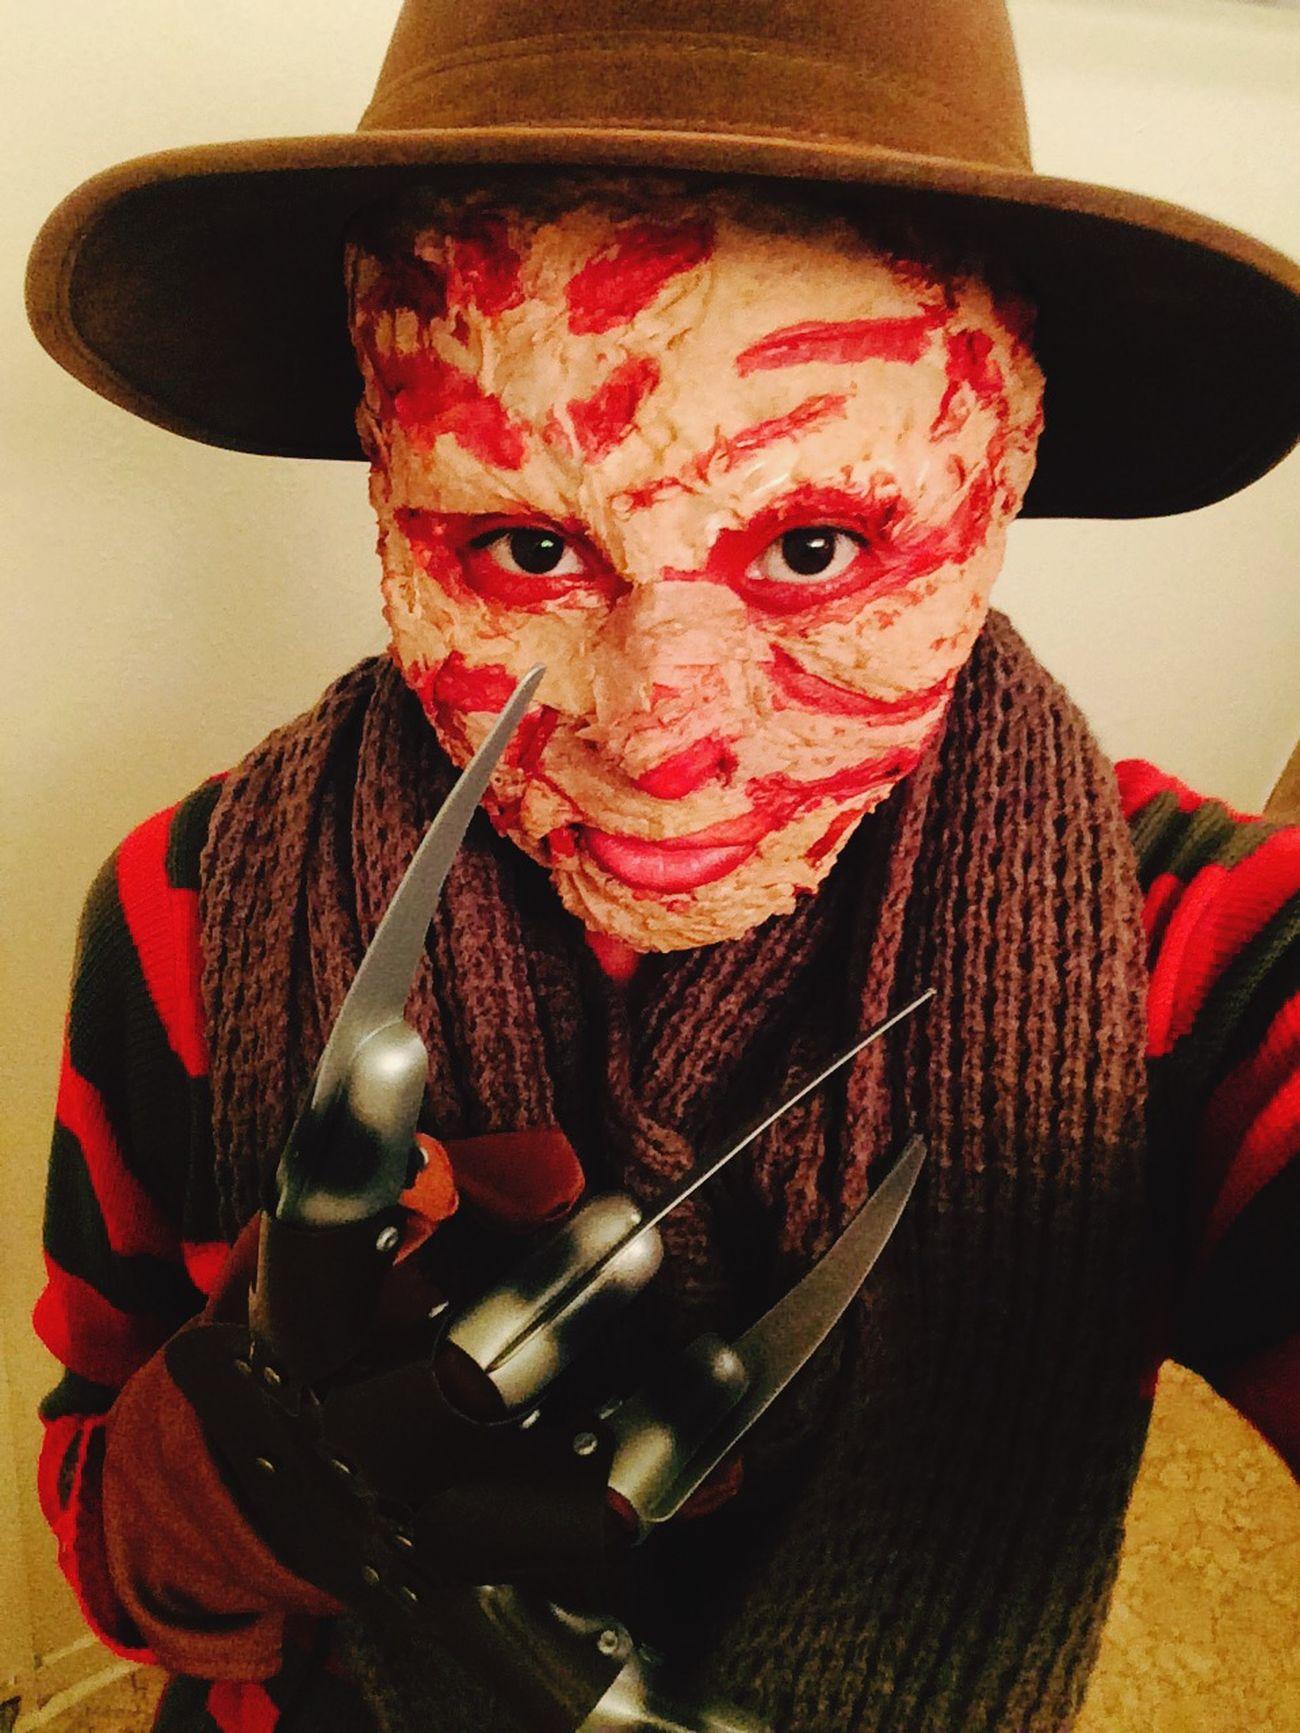 Freddy Krueger But I'm Fredda Krueger